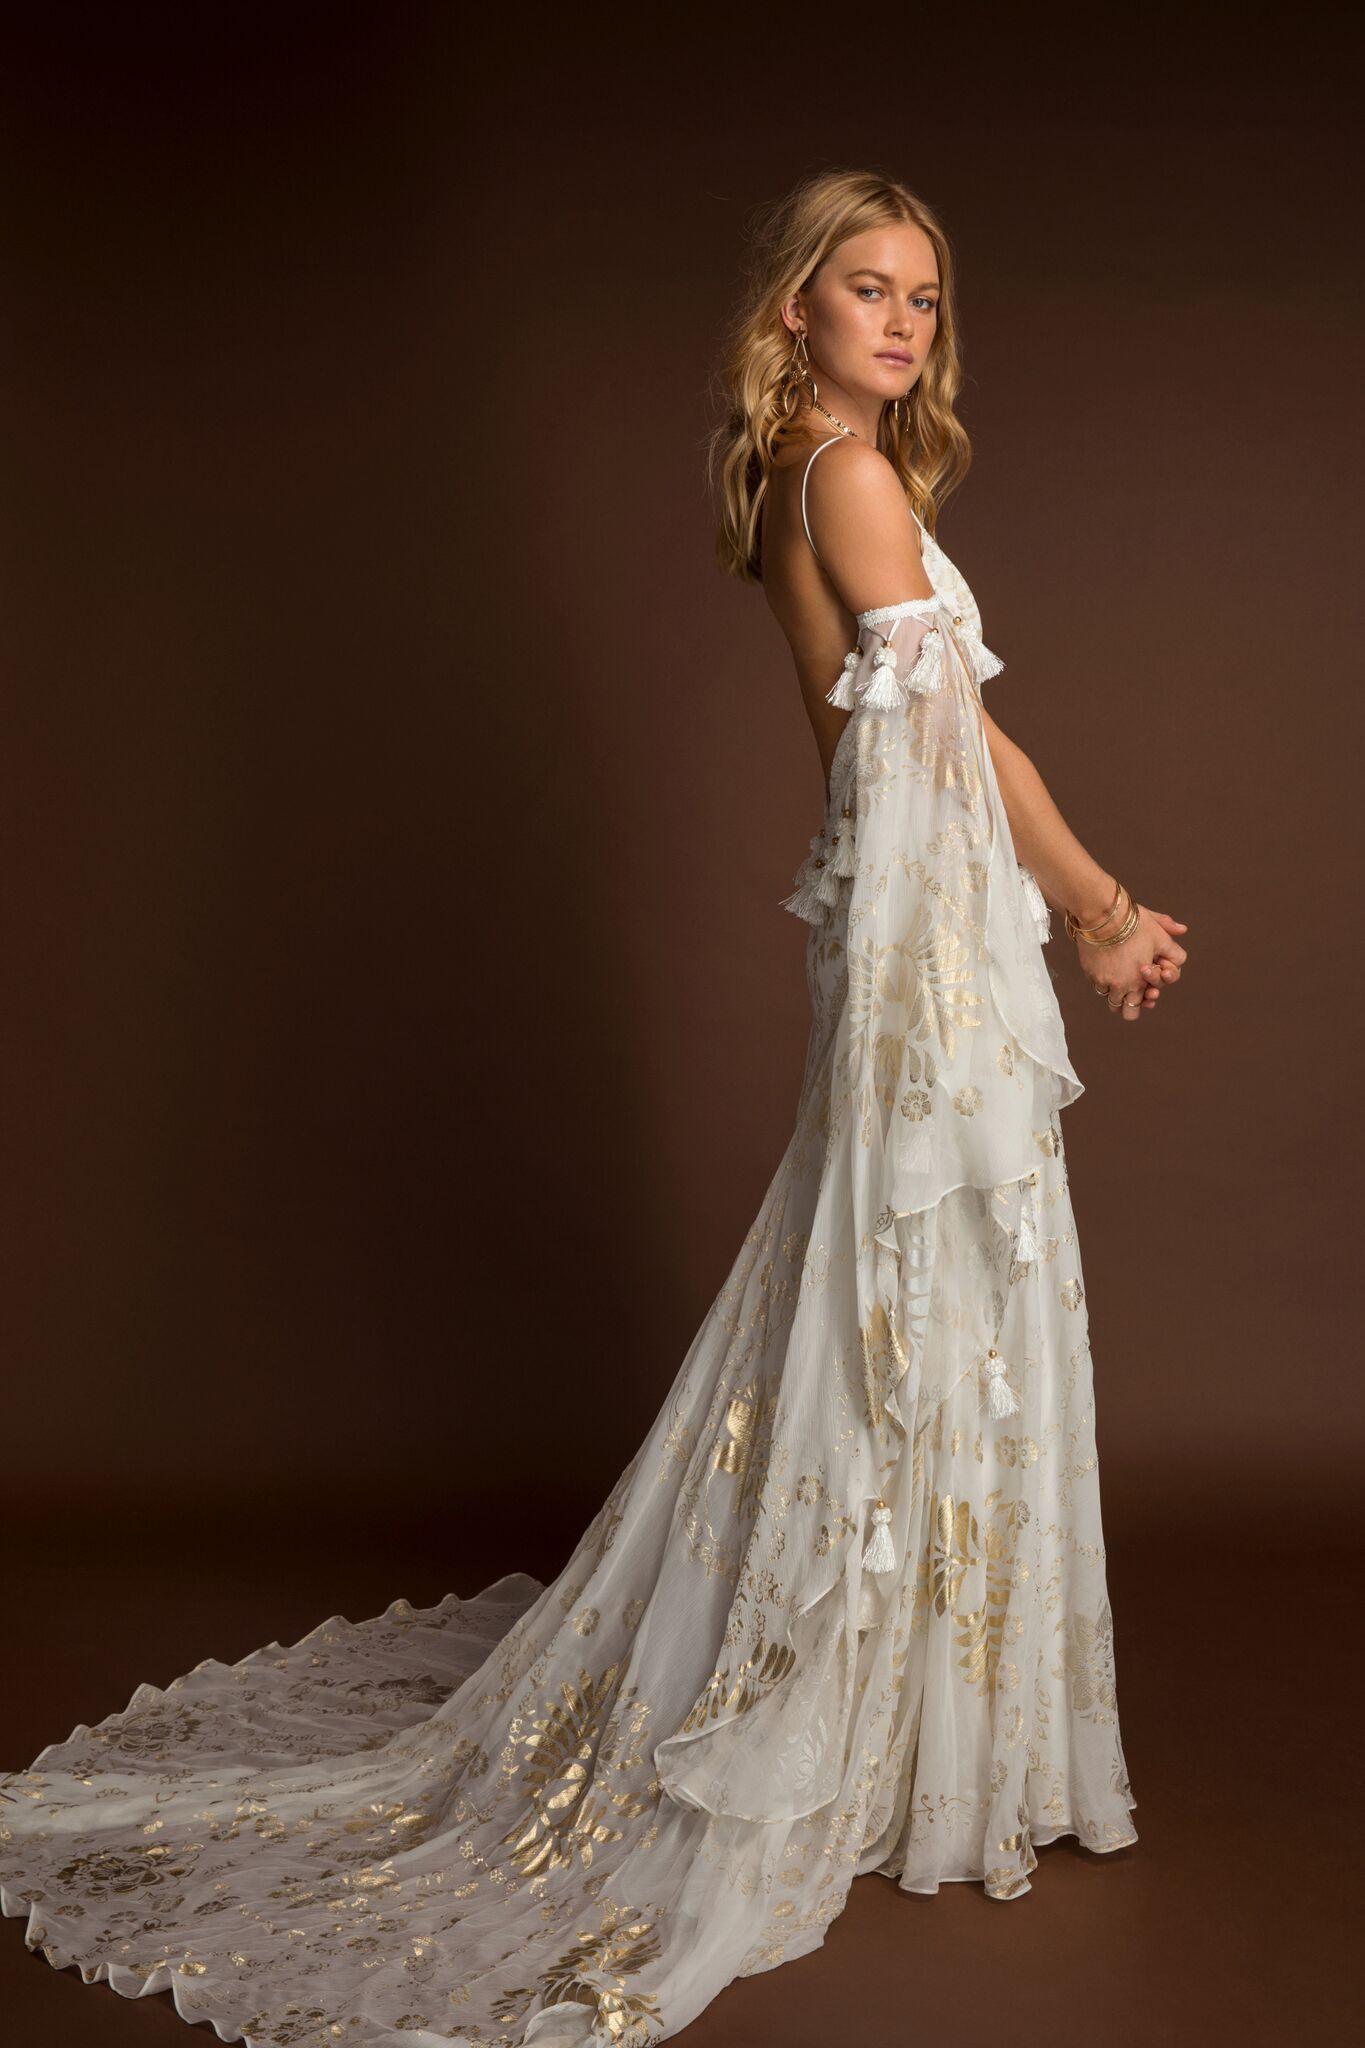 New rue de seine wedding dresses trunk shows in fairytale